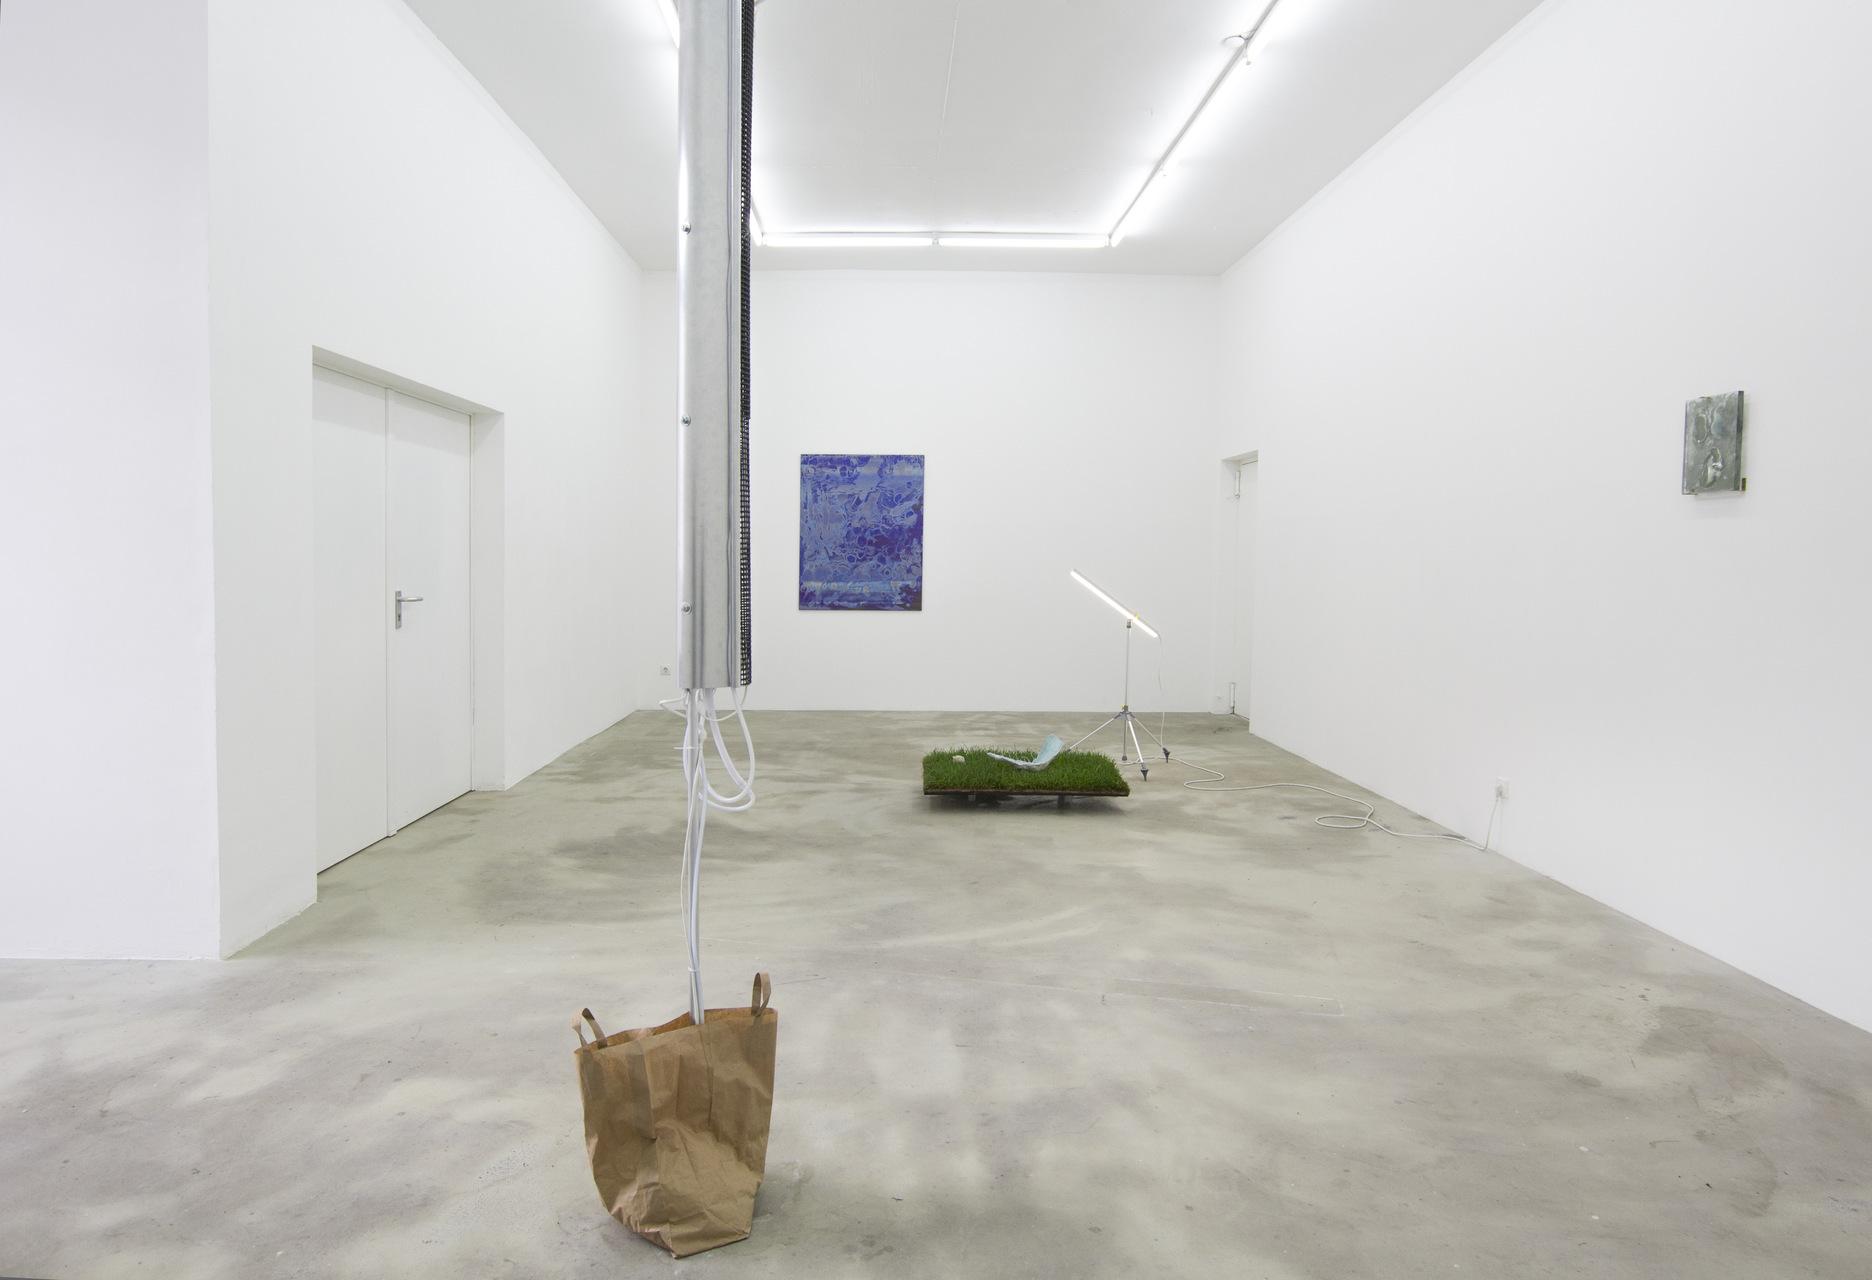 06-soy-capitan-pakui-hardware-mikkel-carl-anna-zett-daniel-stempfer-dominik-gohla-2015